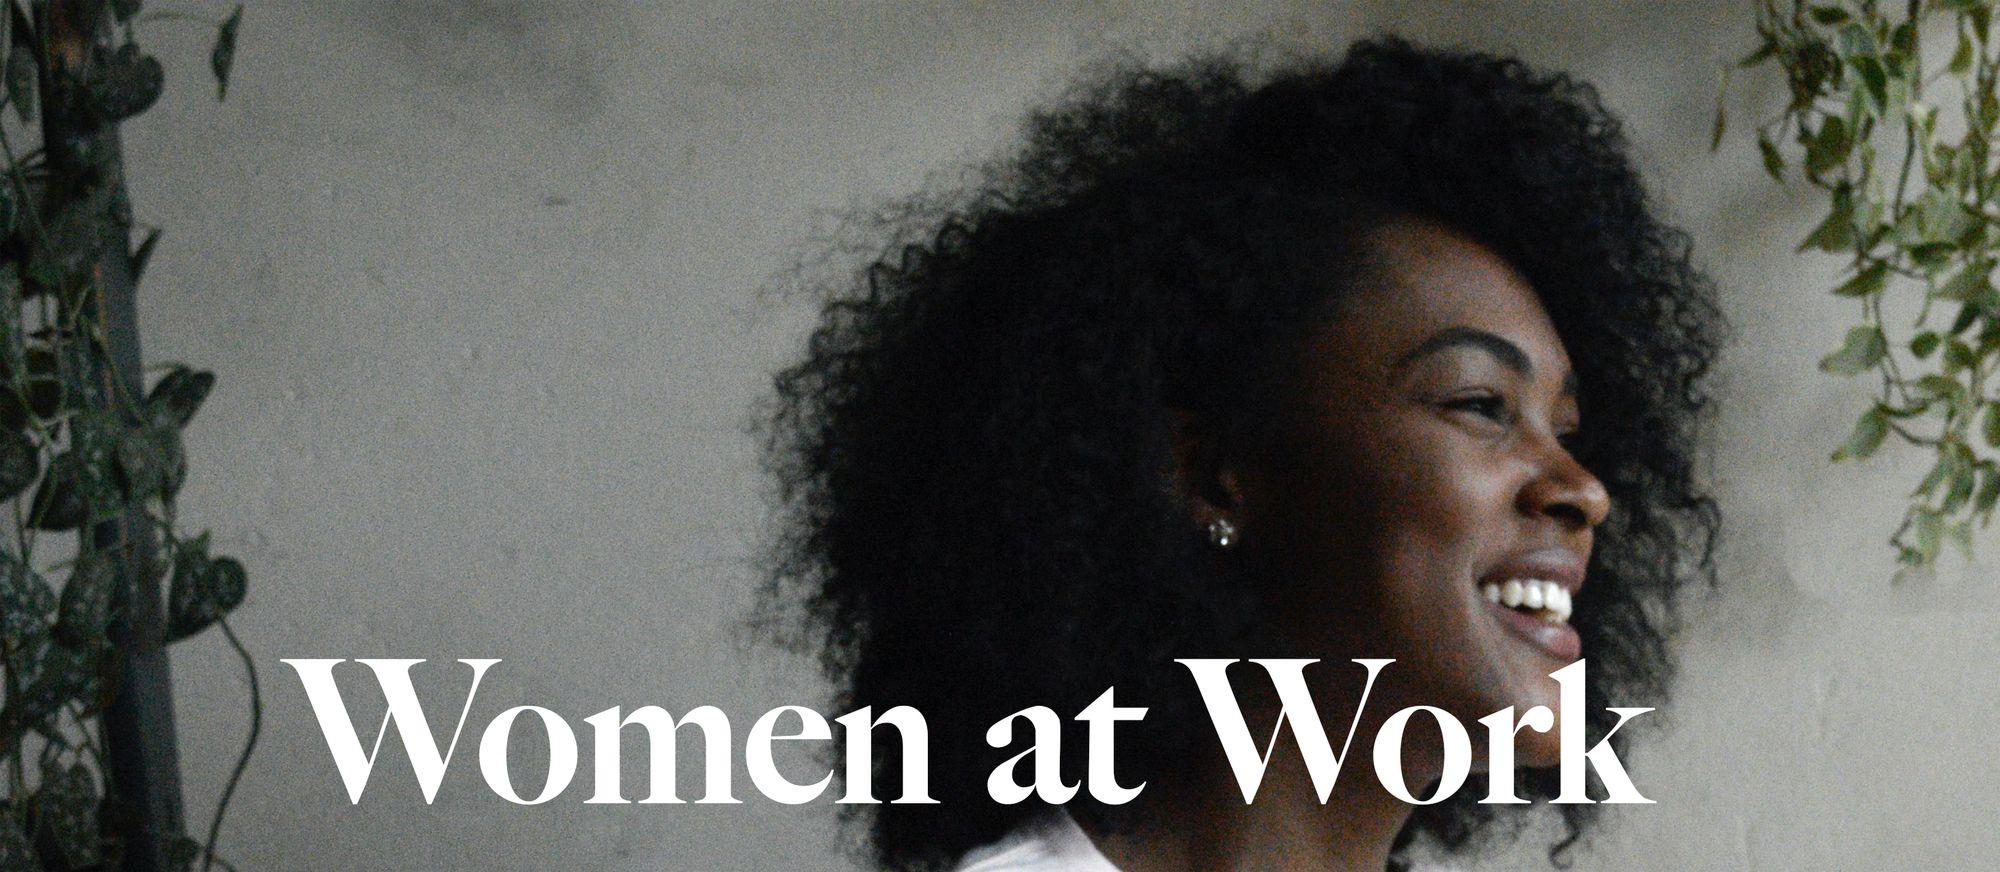 Women at Work - Edition 6